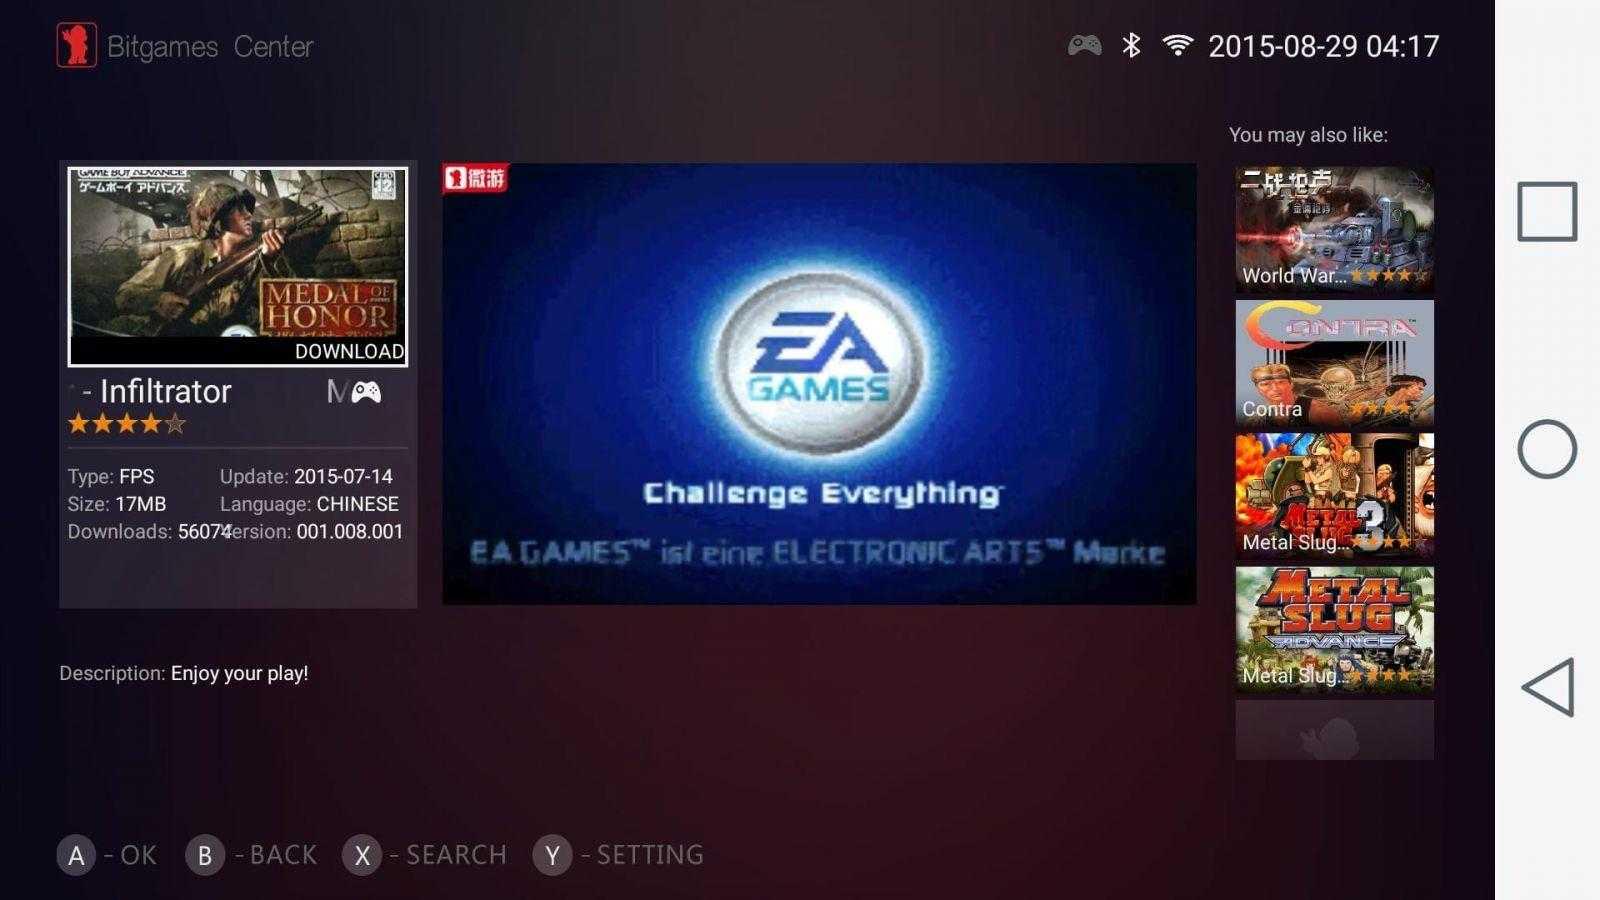 Обзор Bluetooth-геймпада iPega PG-9021 Обзор Bluetooth-геймпада iPega PG-9021